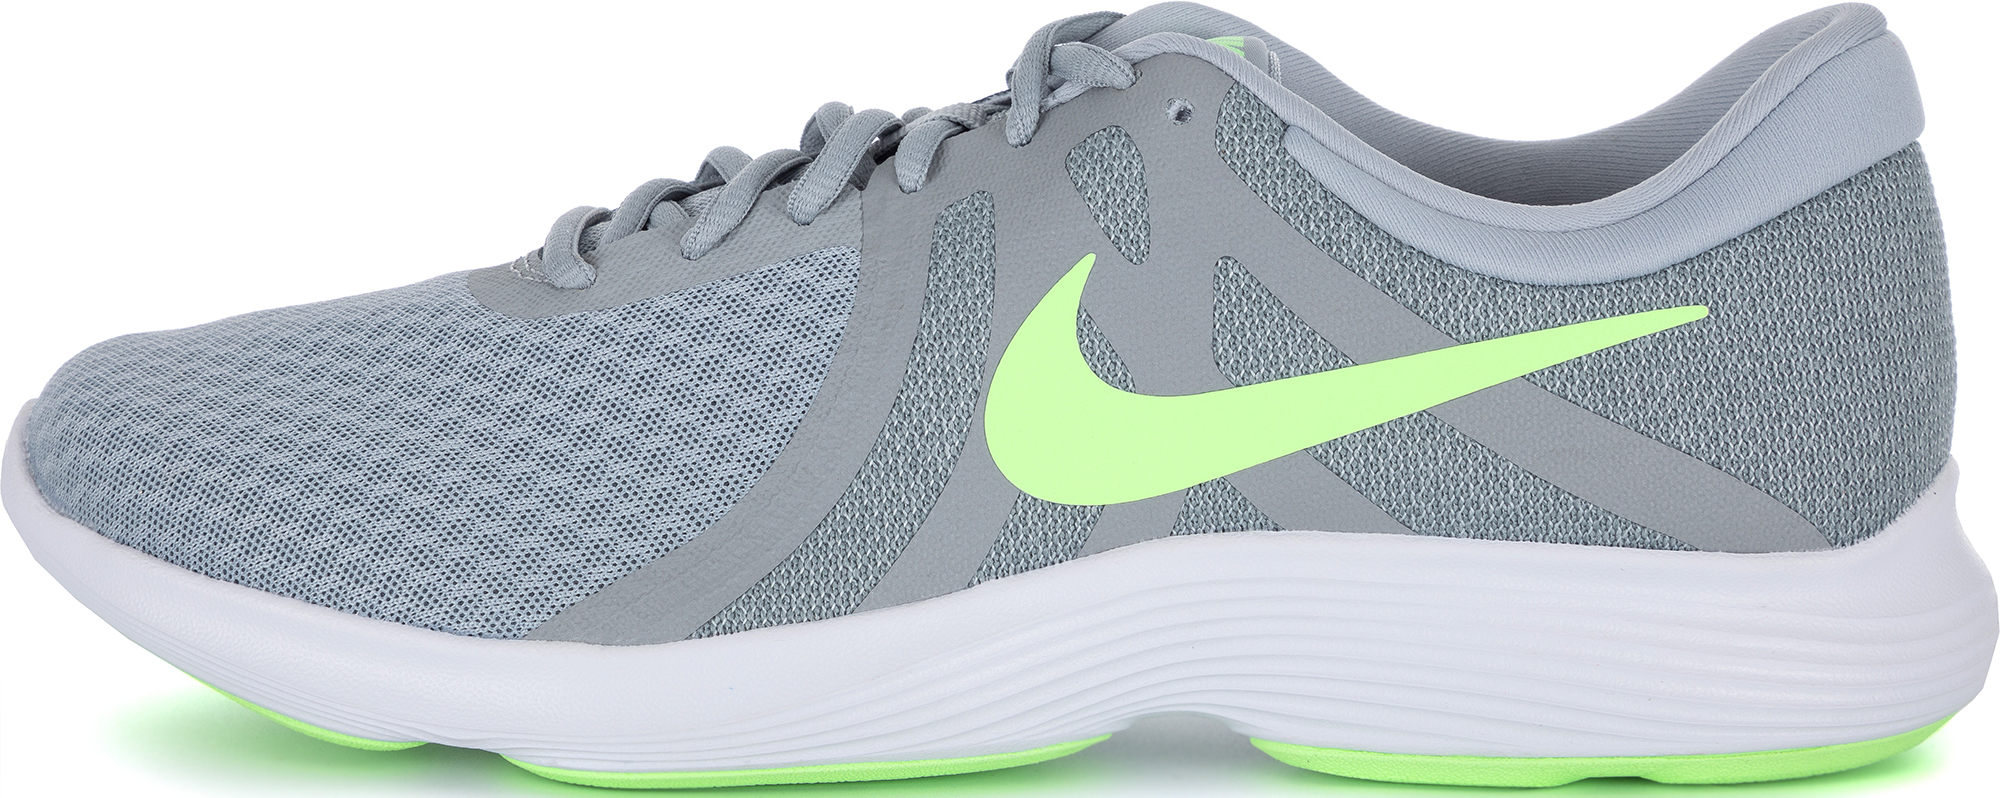 Nike Кроссовки мужские Nike Revolution 4, размер 43